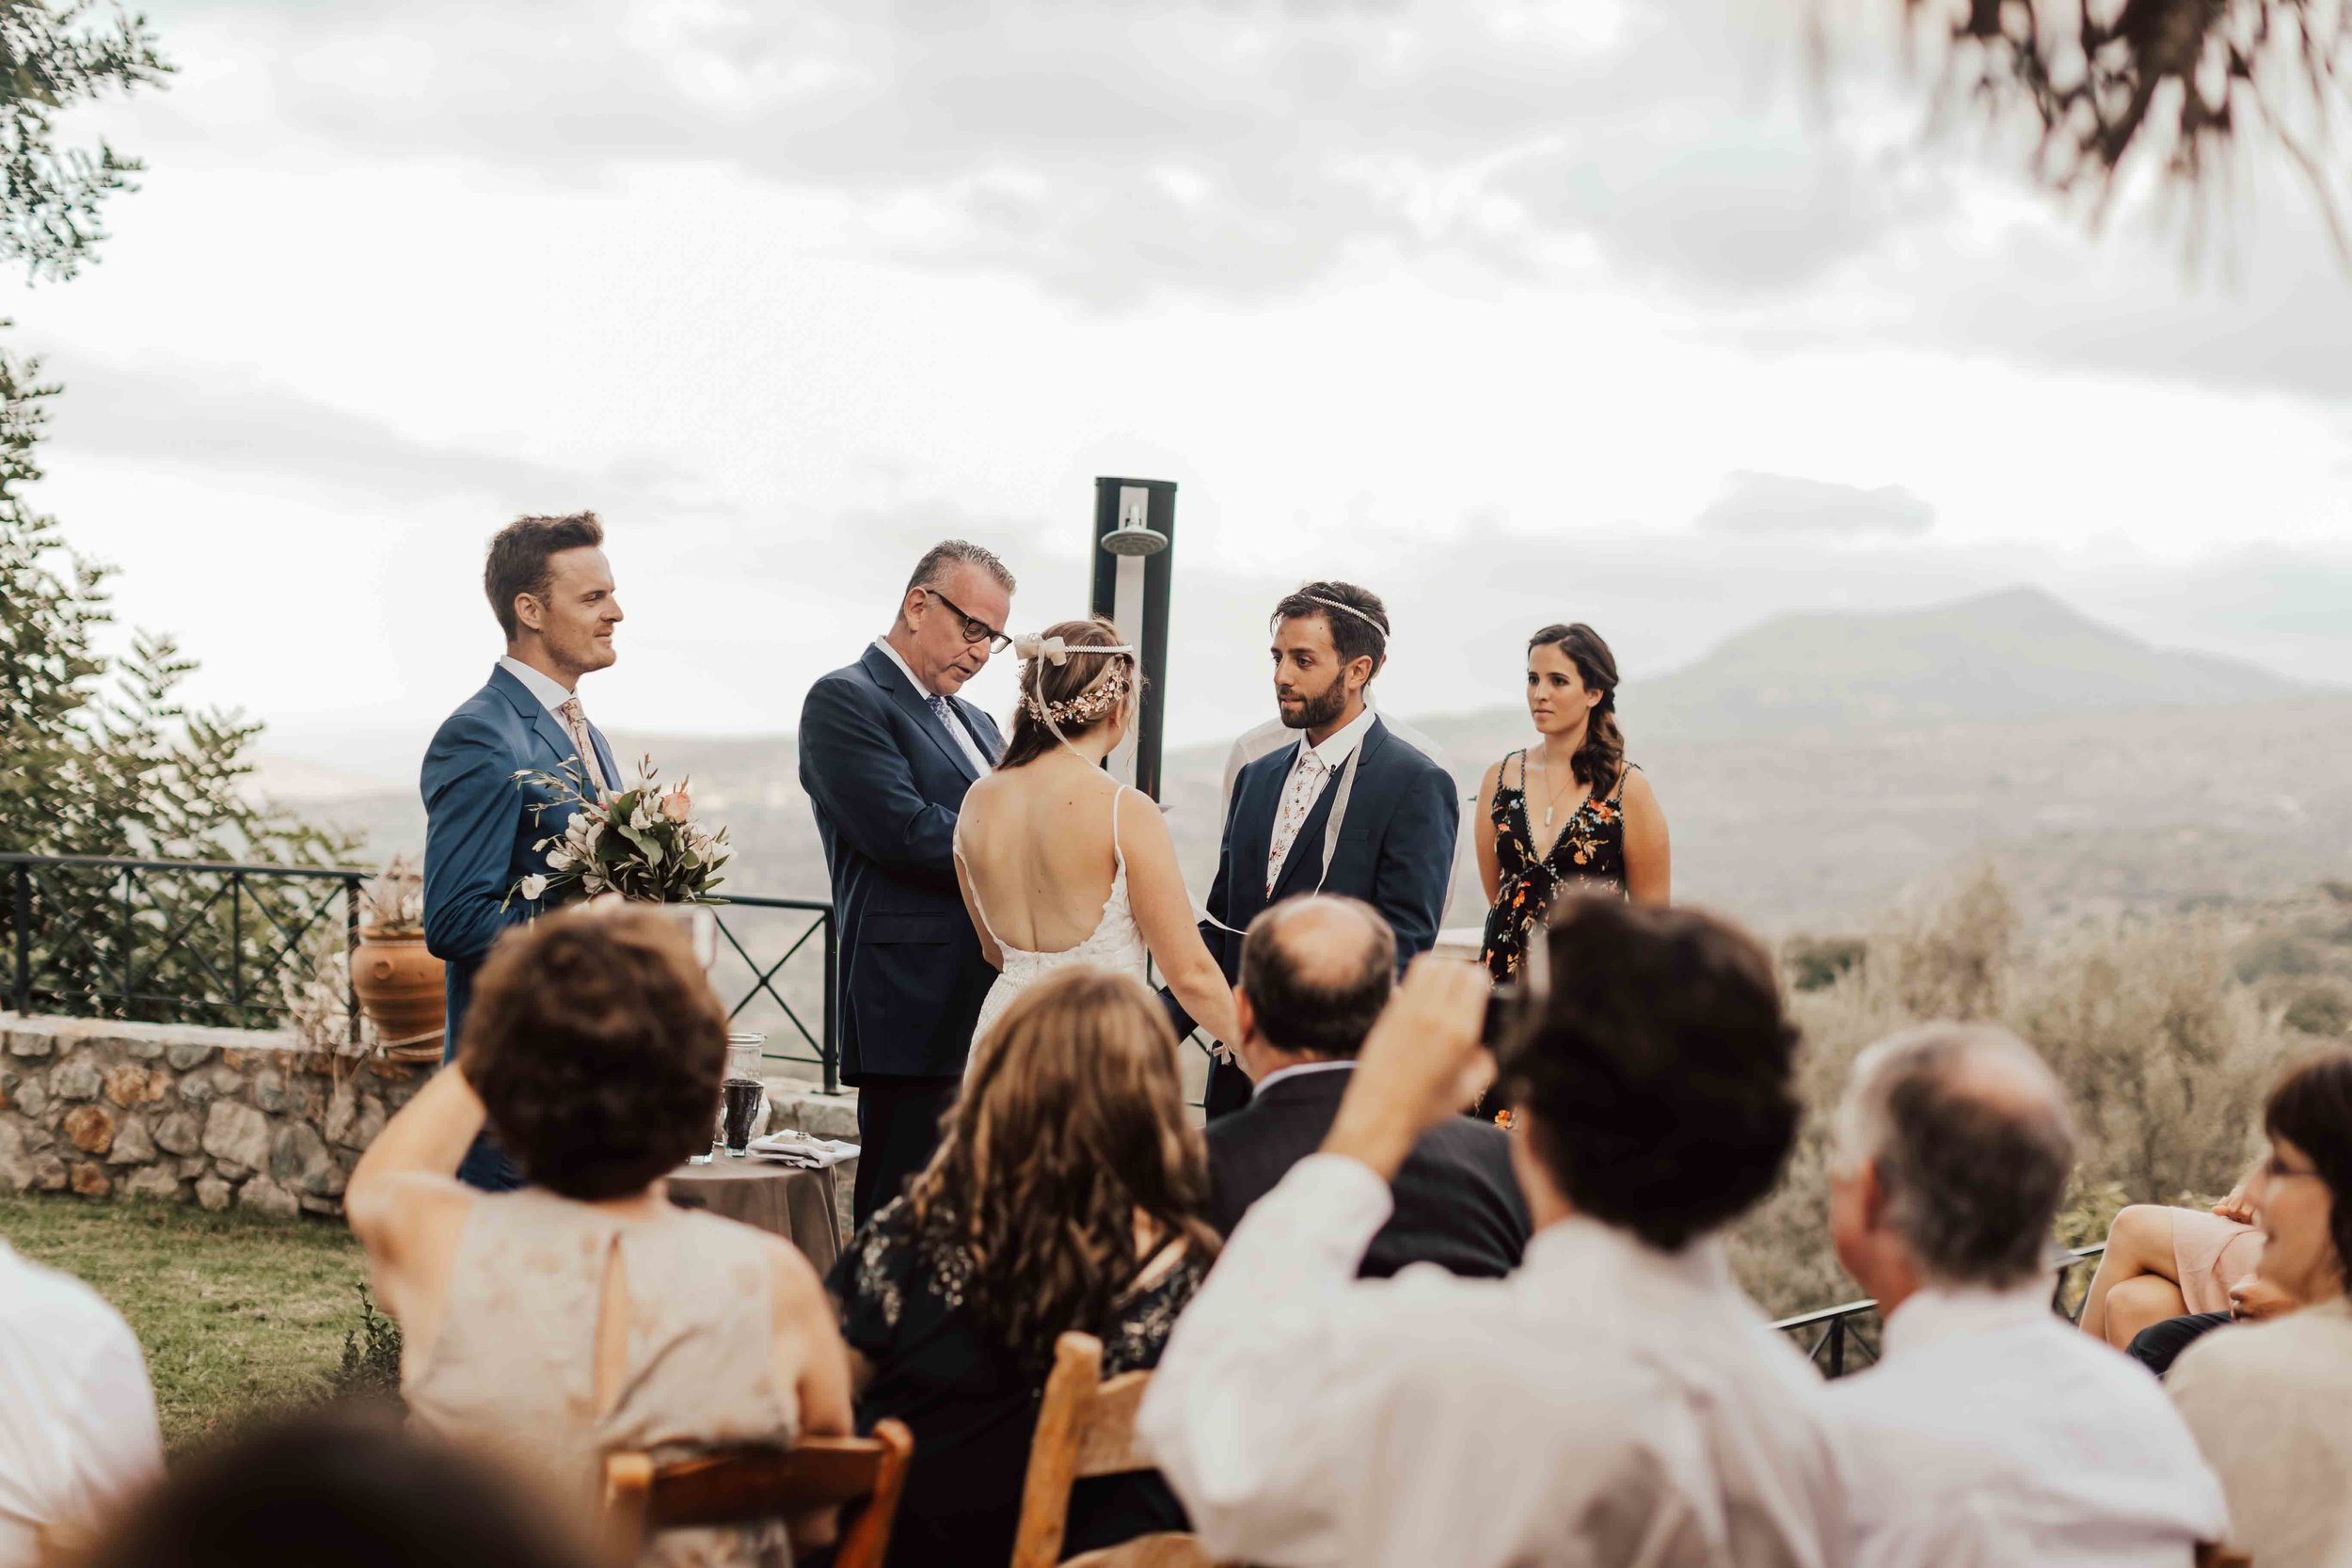 weddingday-13.jpg